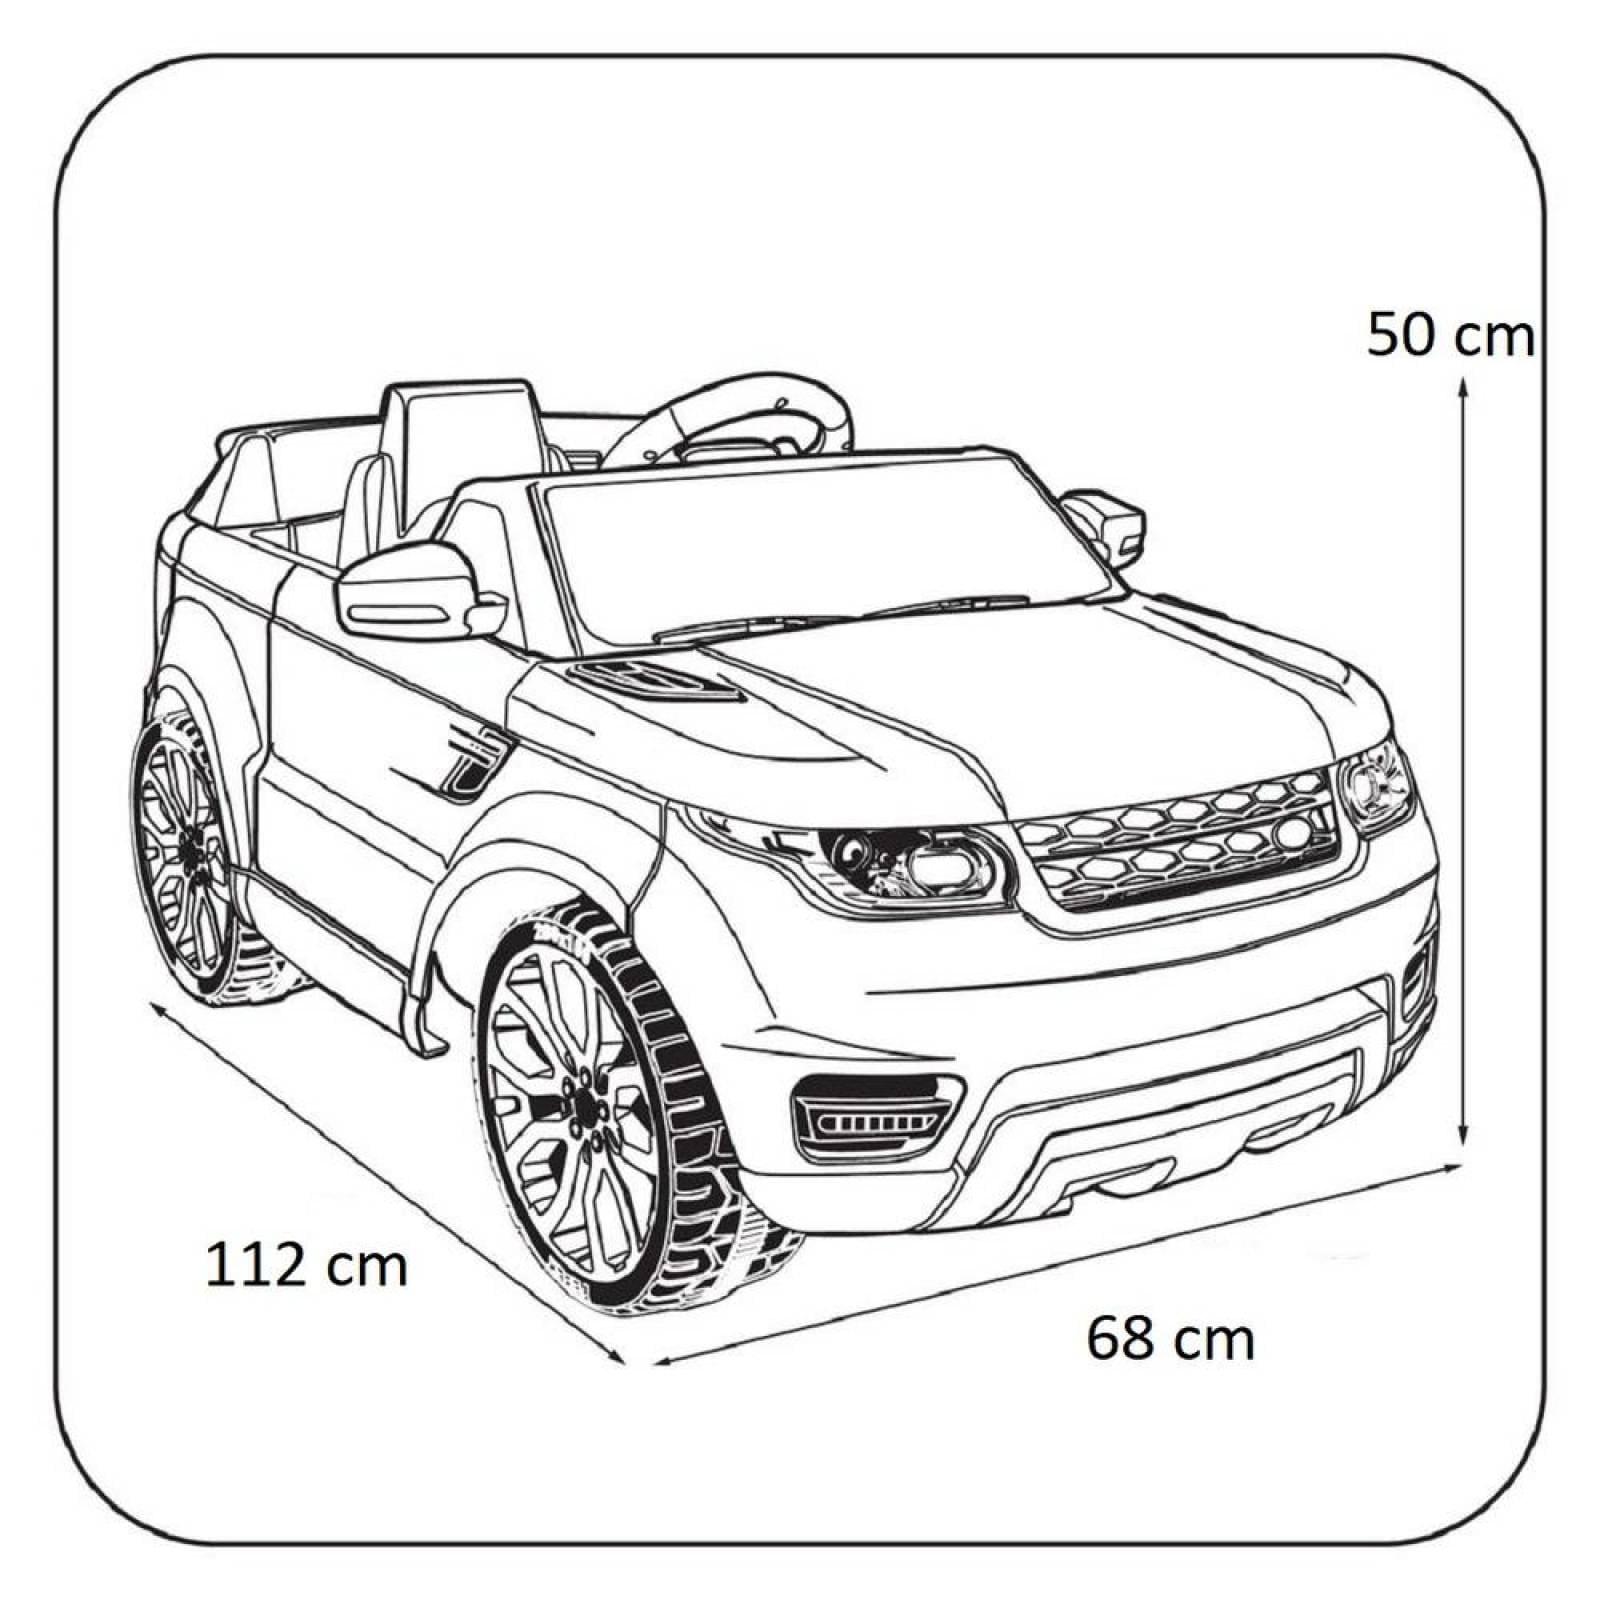 Carro Electrico Montable Con Control Negro USBMusicaRadio